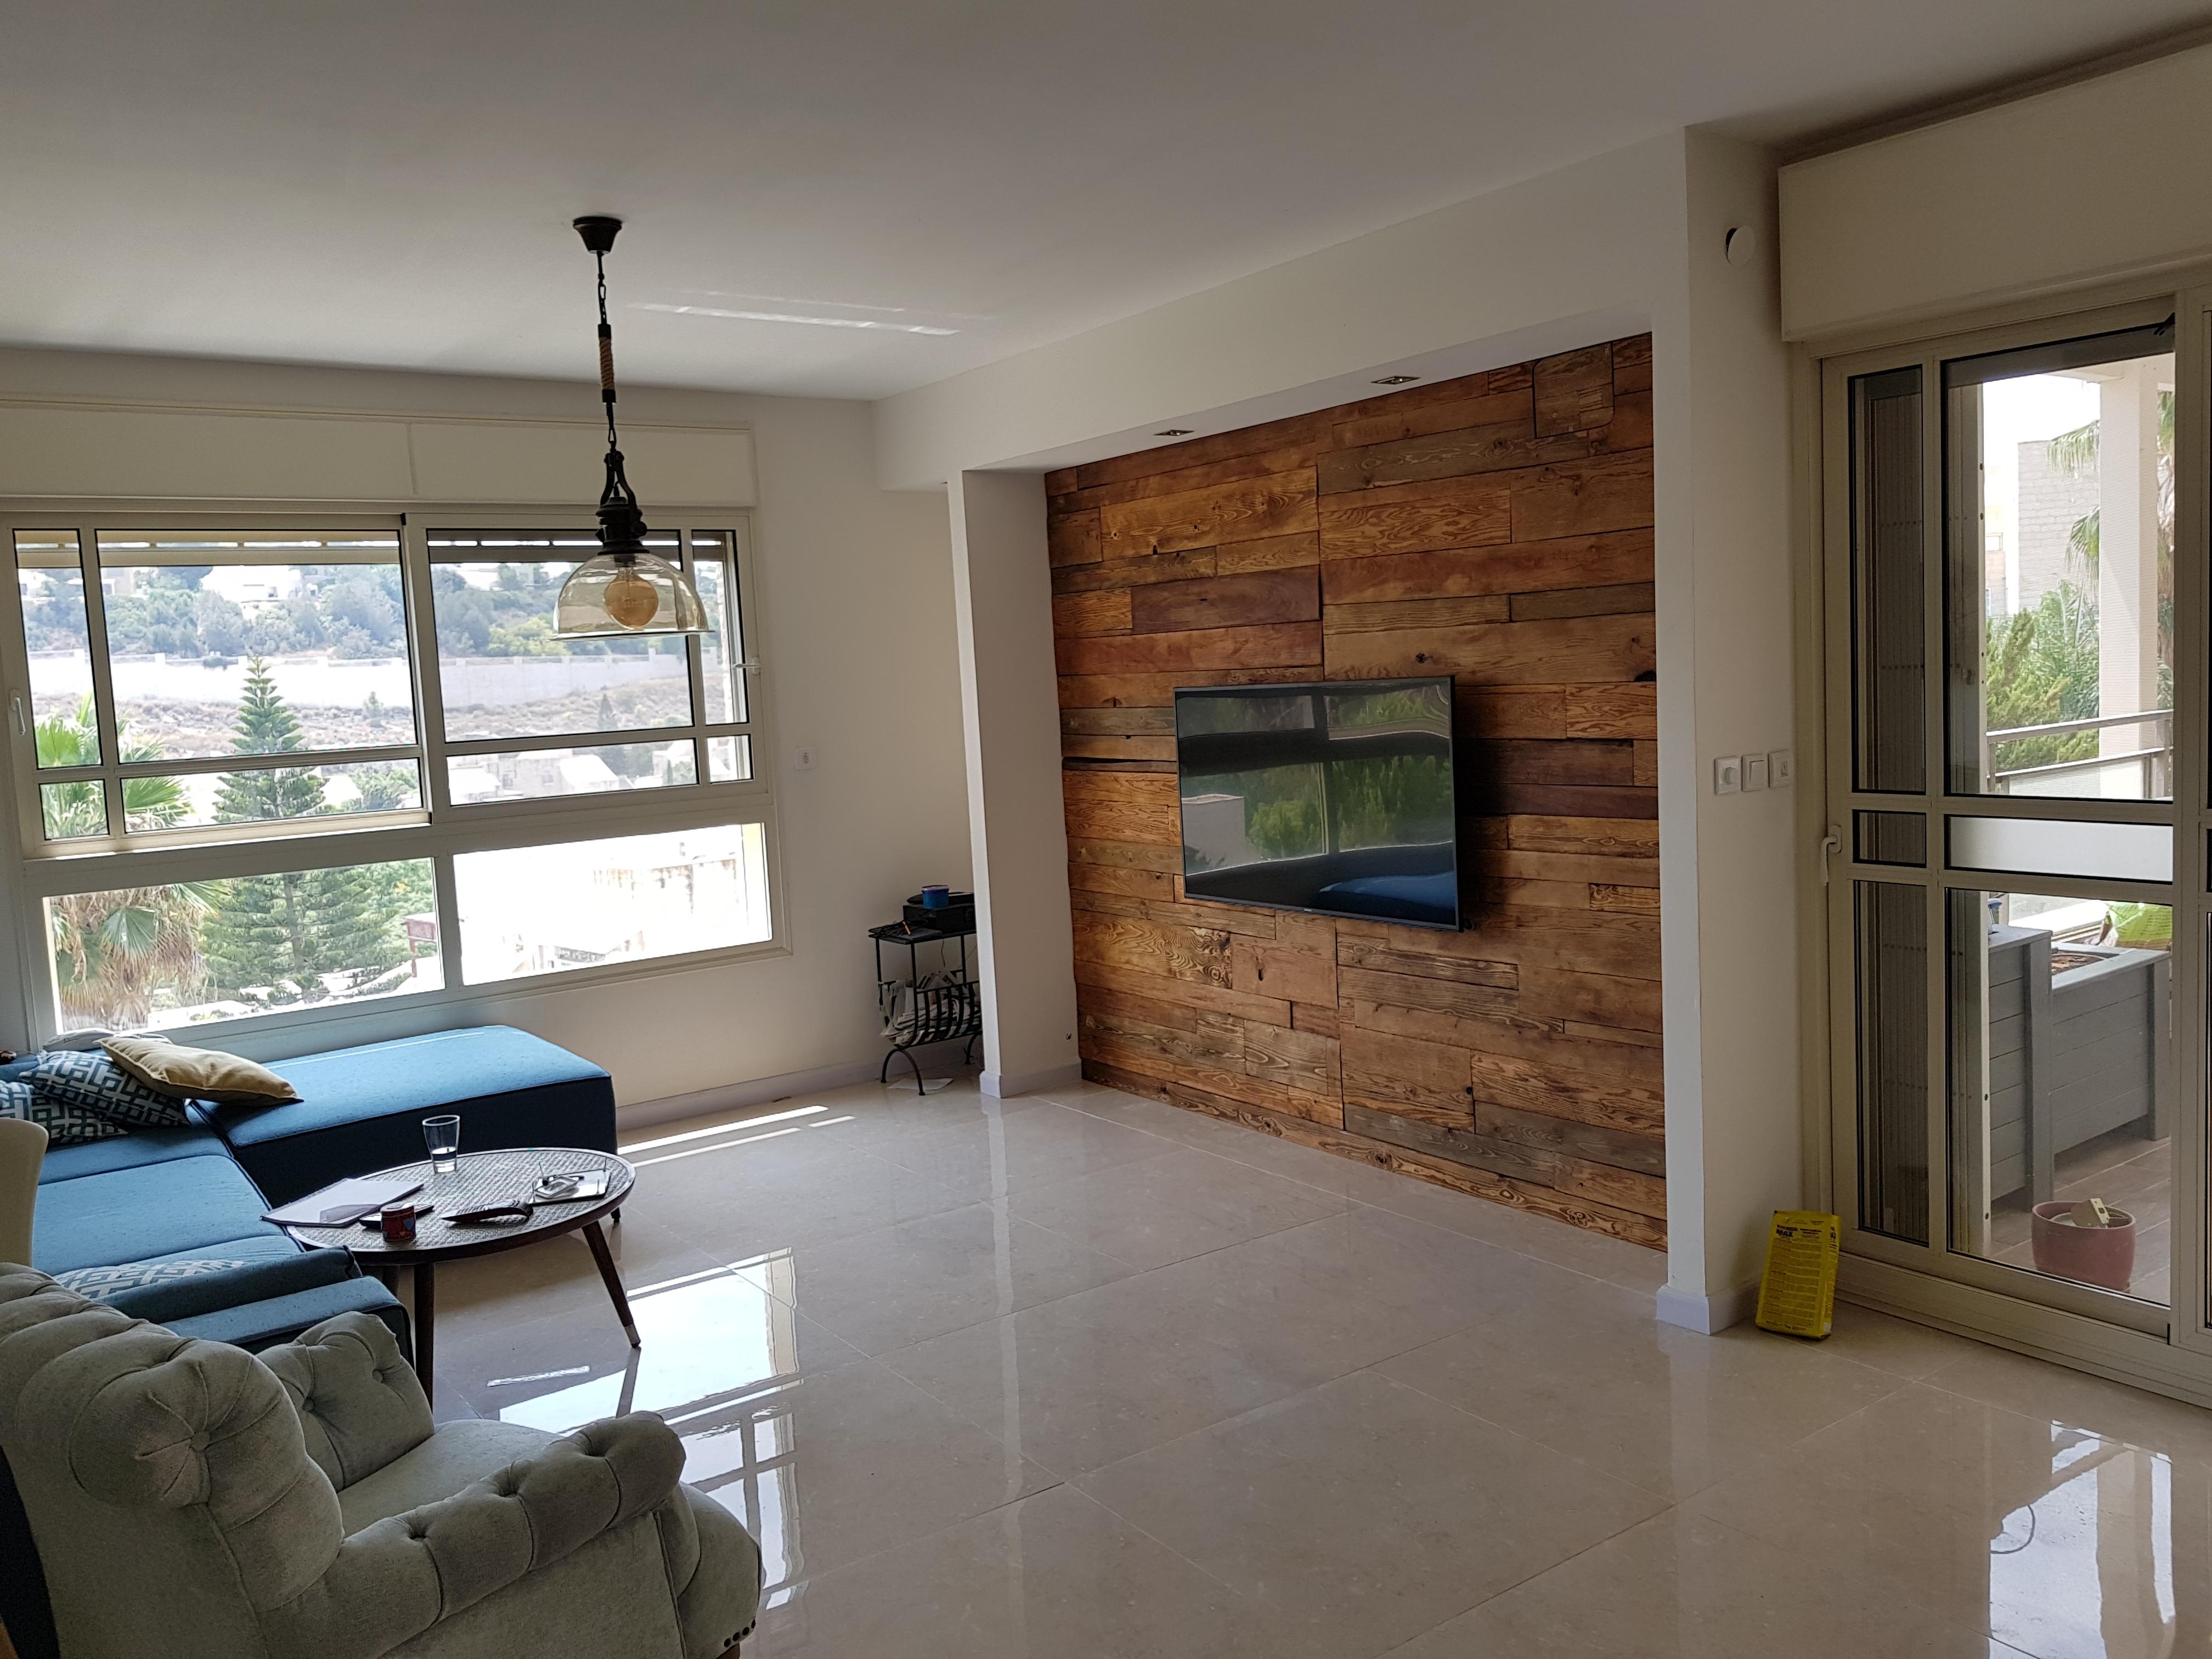 חיפוי קיר טלוויזיה בעץ